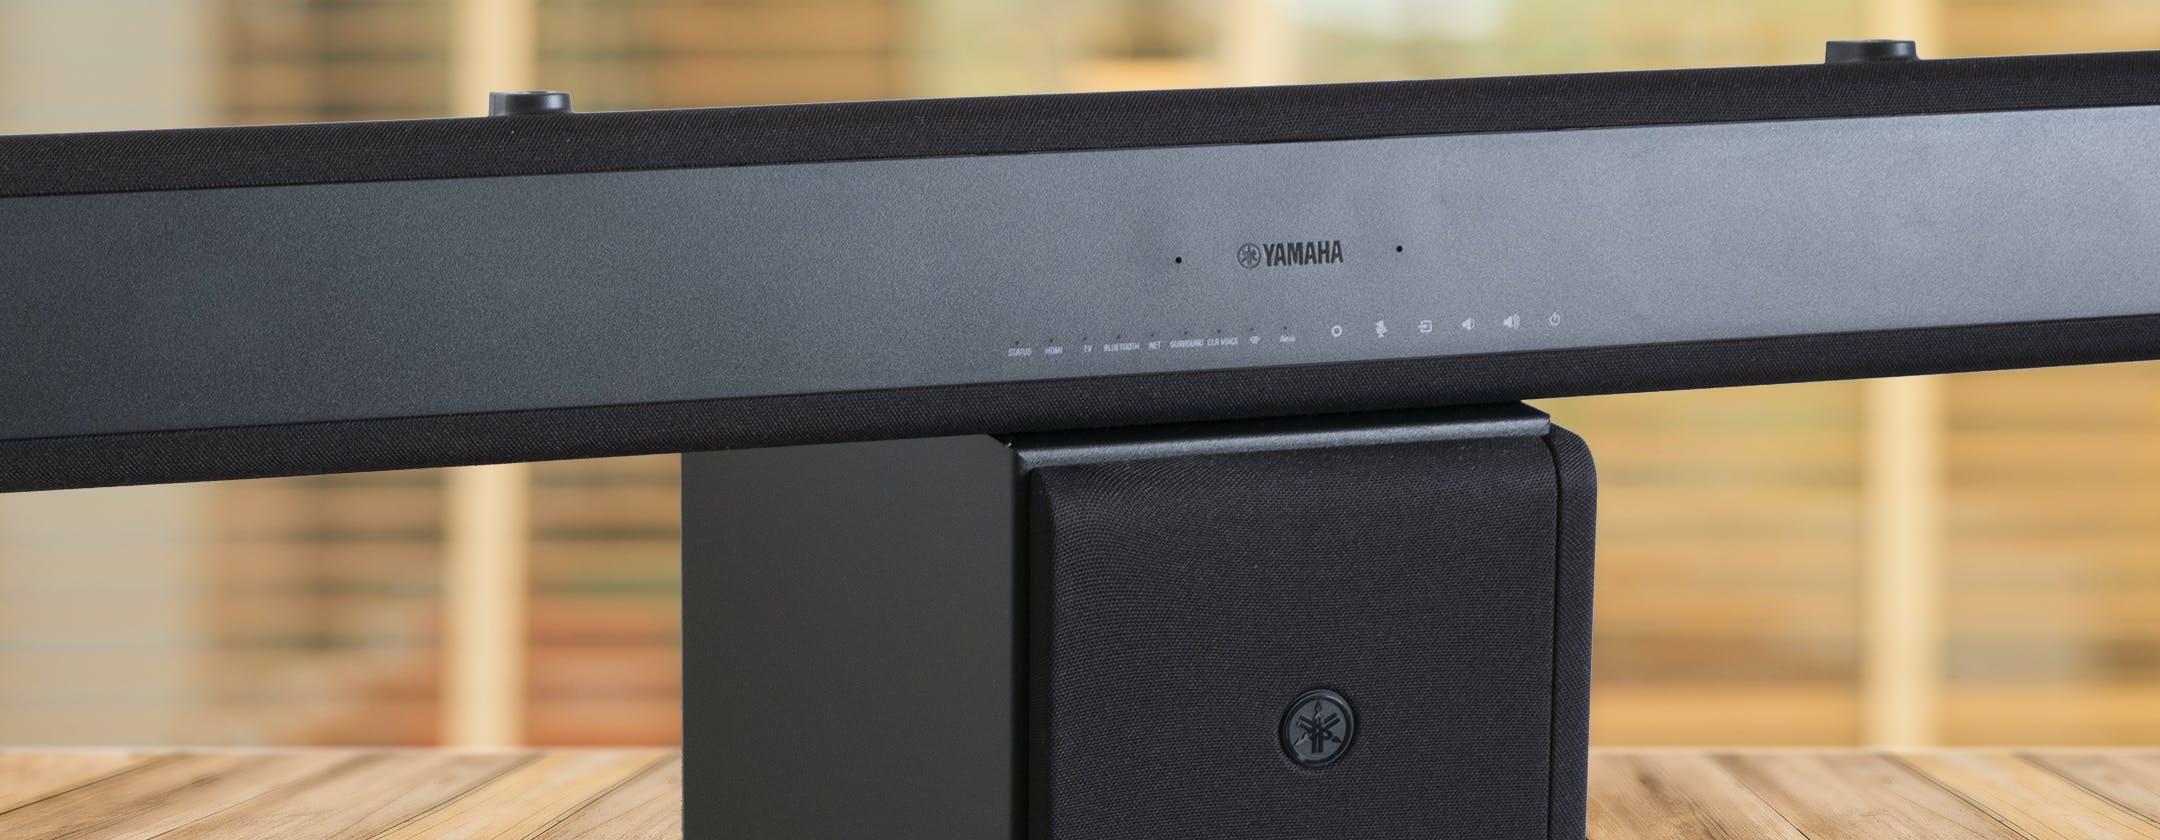 Soundbar Yamaha YAS-209 in prova: minima spesa massima resa